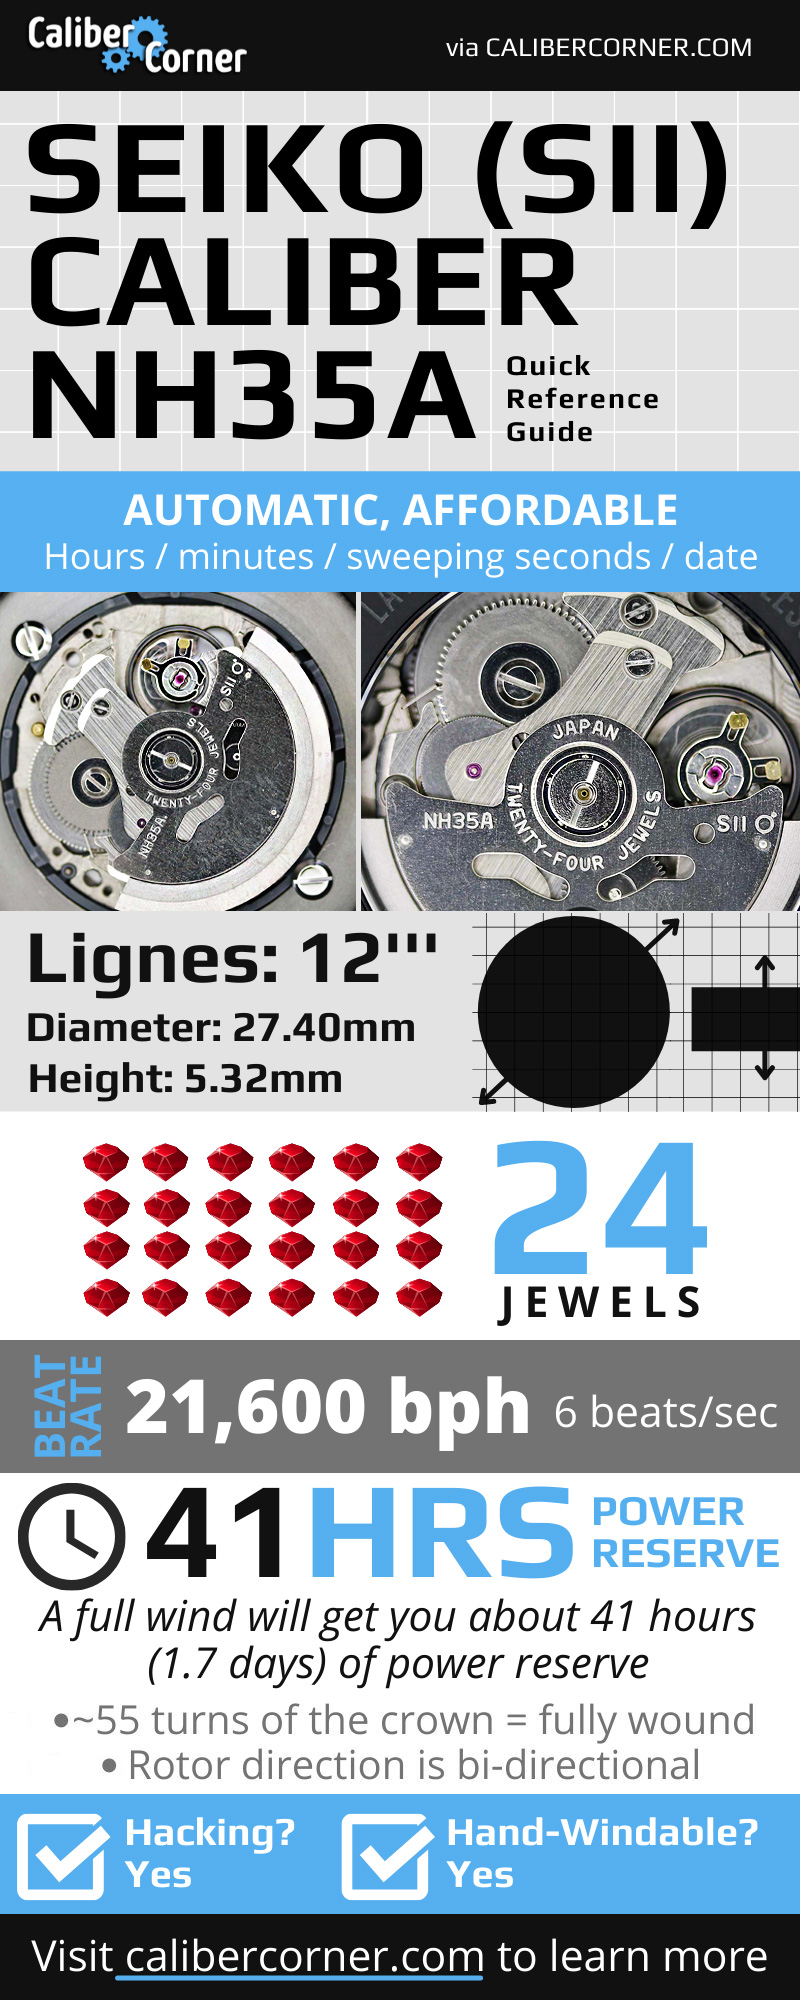 Seiko Caliber Nh35a Infographic